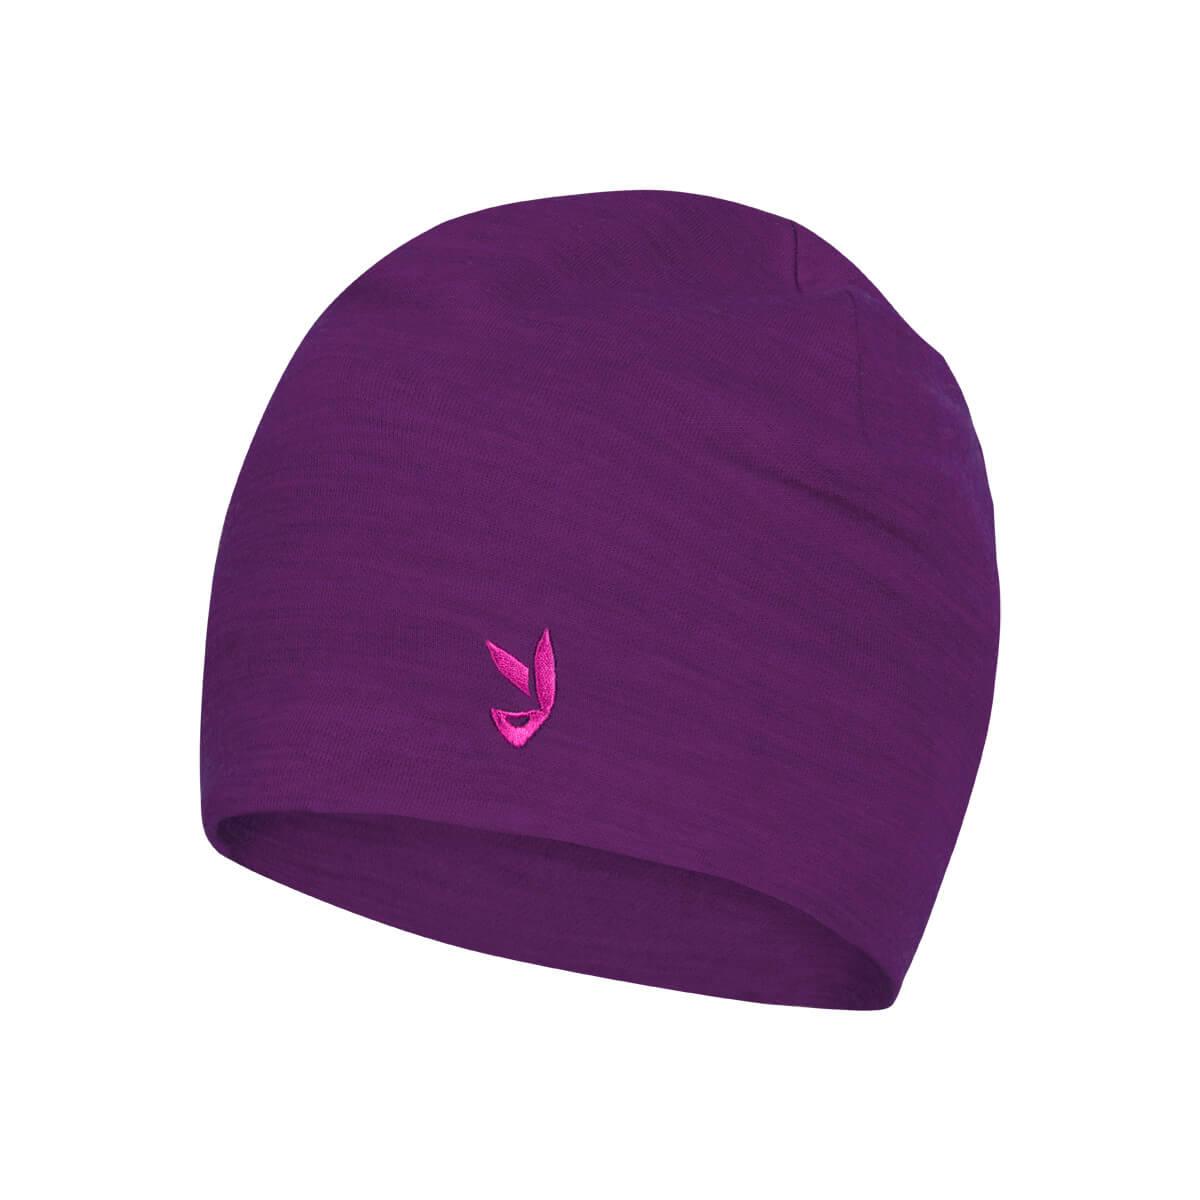 Detská čiapka Ikoo Kids Merino Beanie Dark Purple S